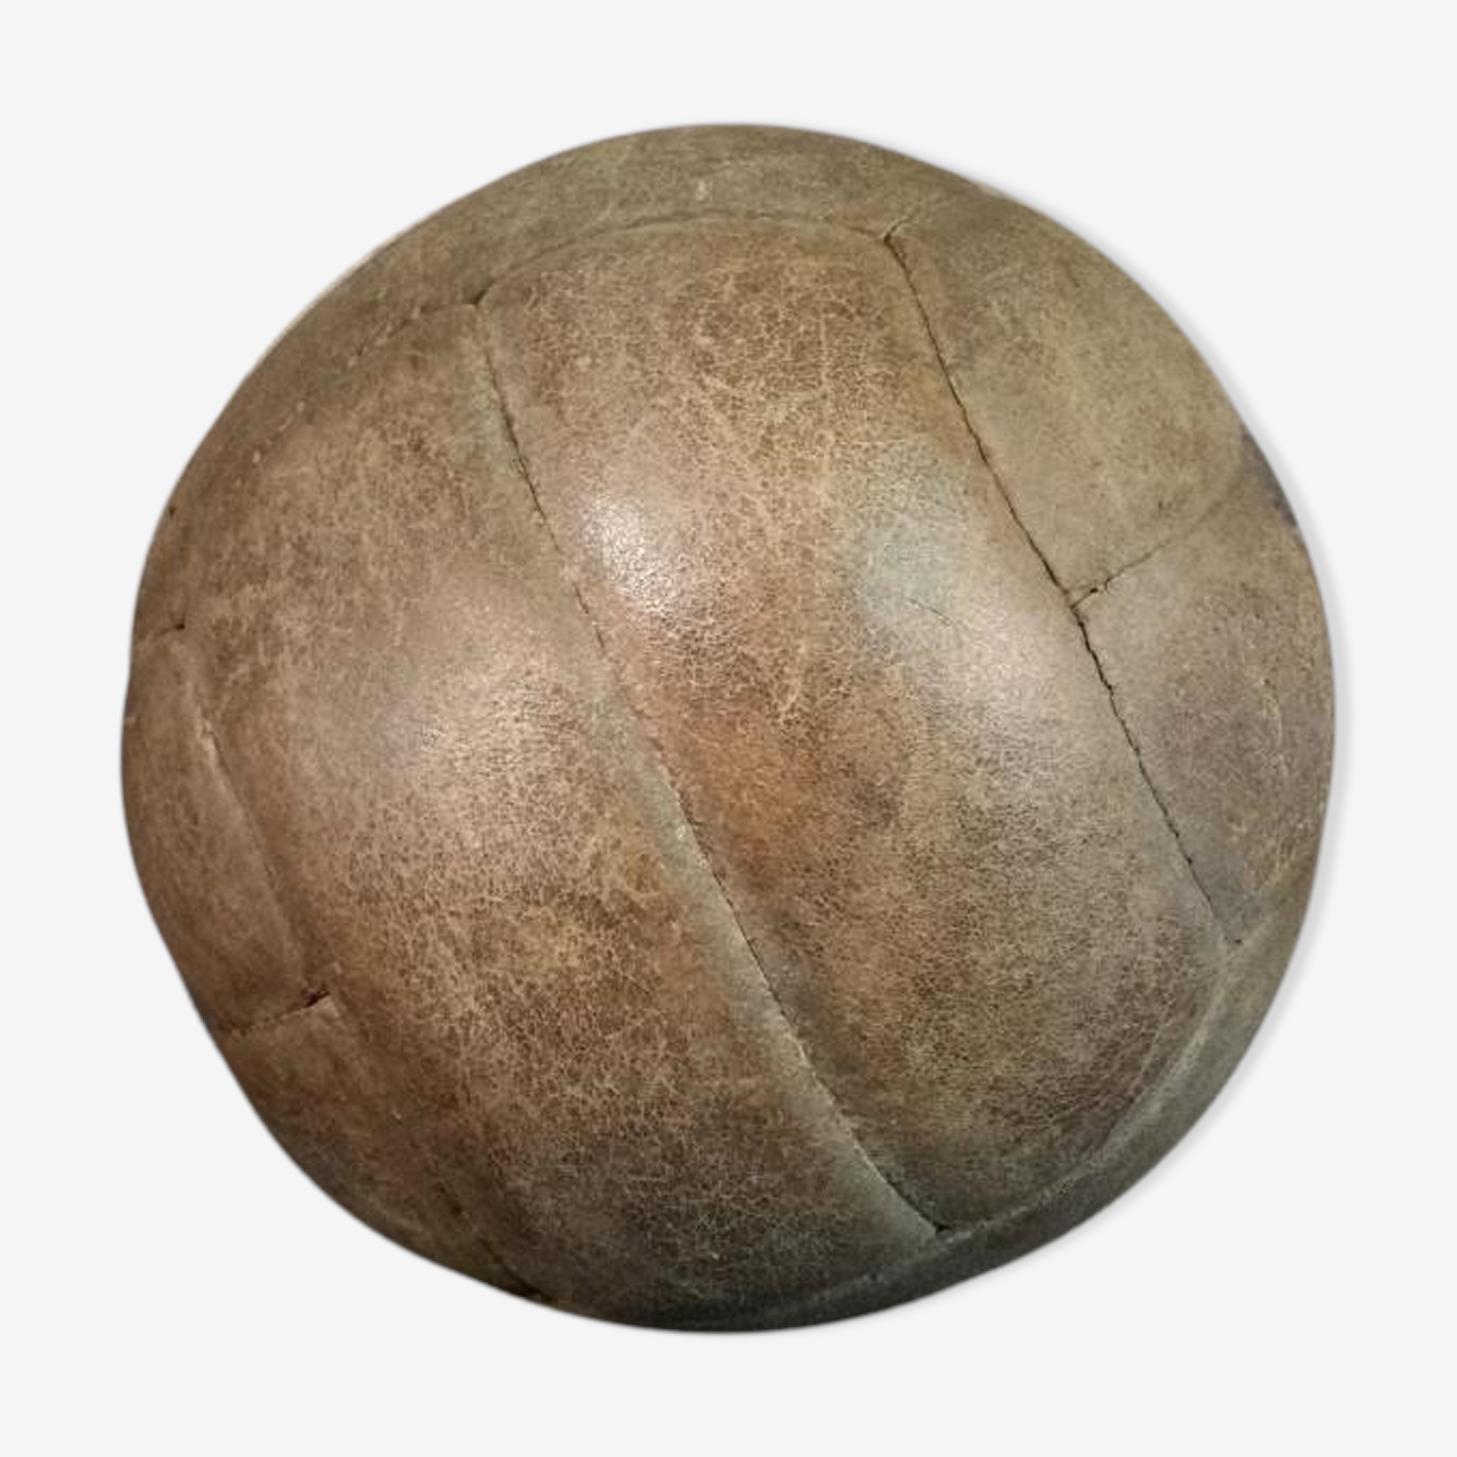 Ballon de sport vintage